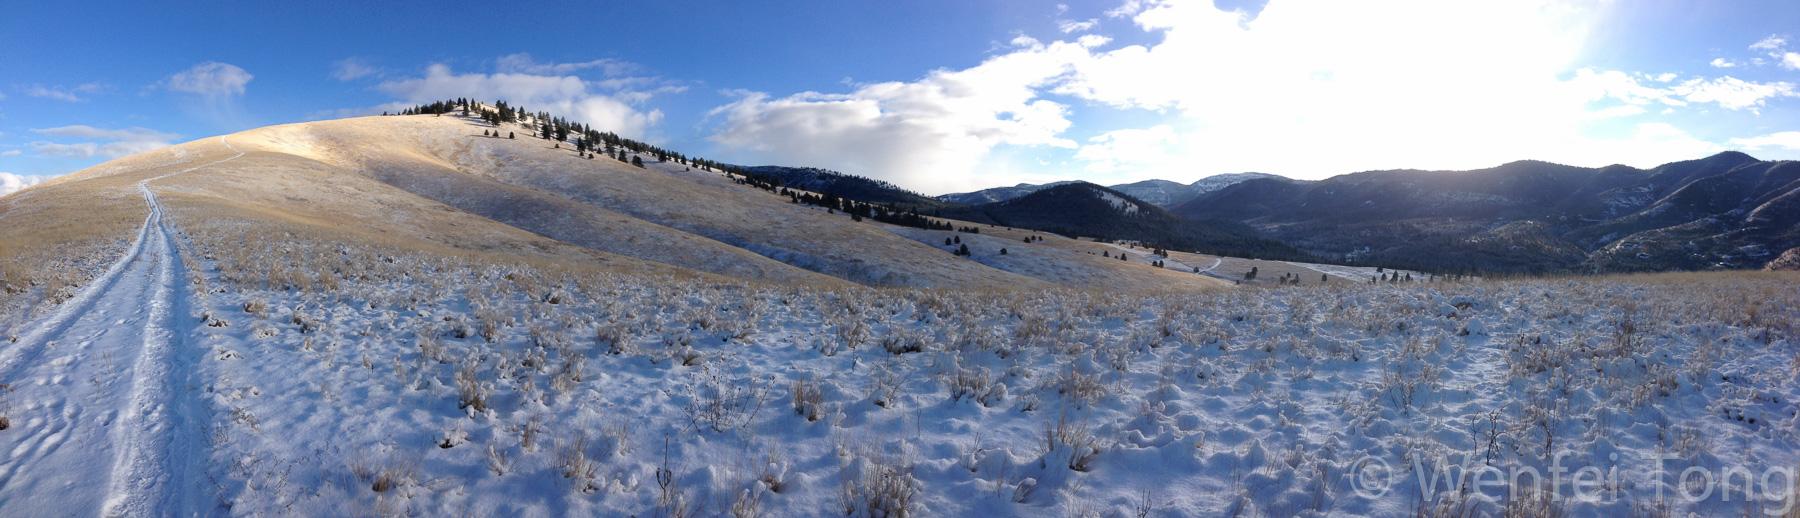 Mount Sentinel in winter